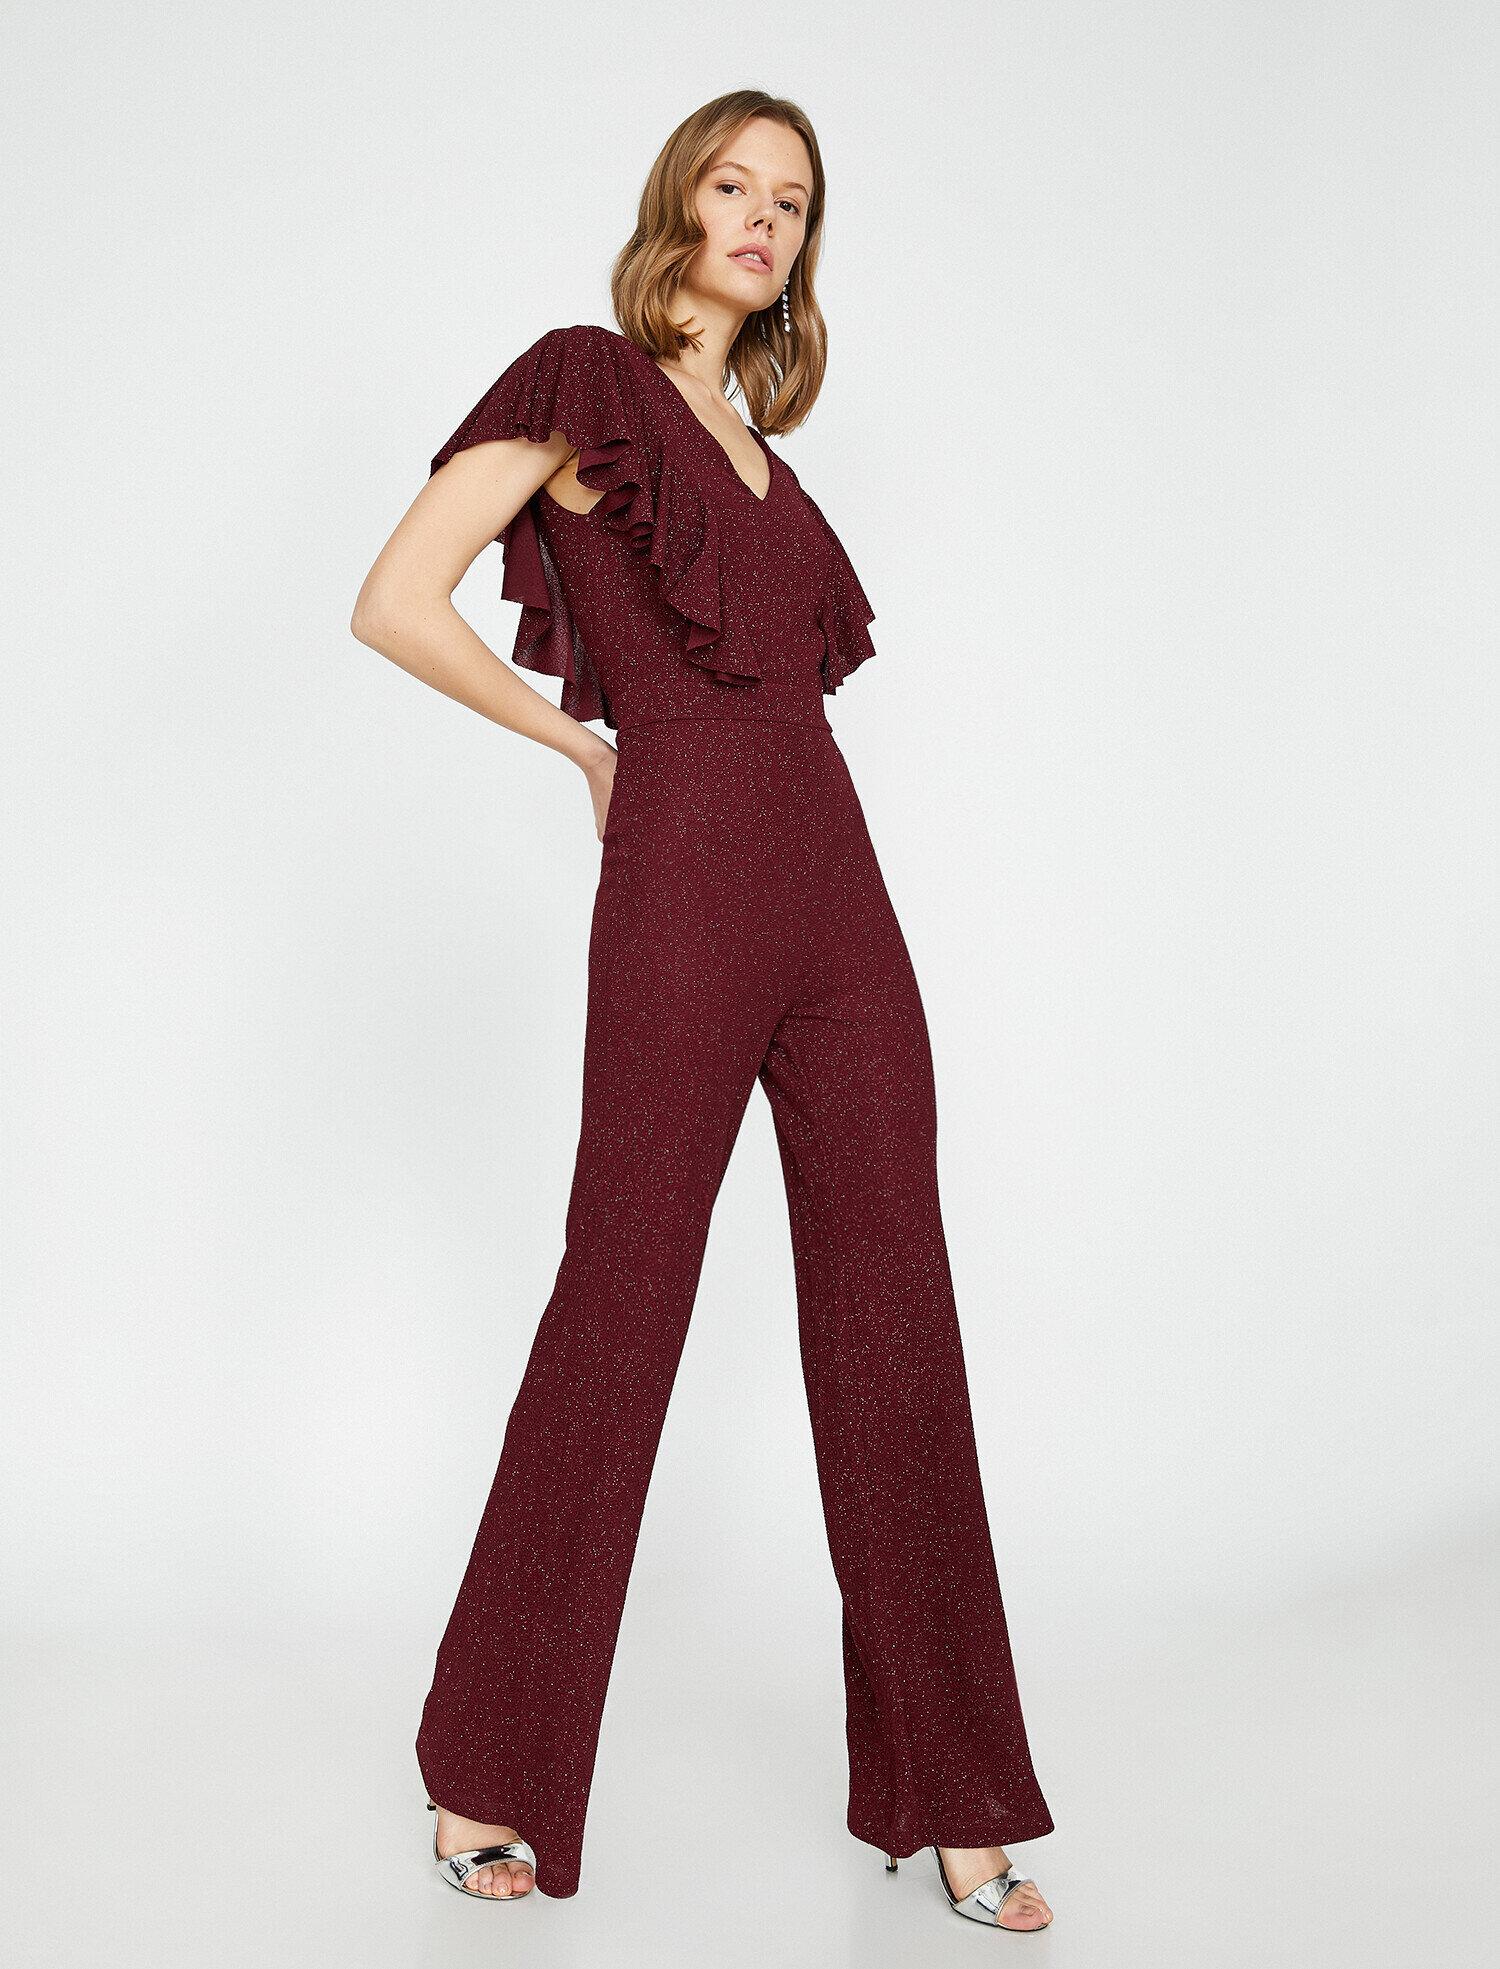 6236237a6f1fc Wine Women Shimmer Detailed Jumpsuit 9KAK44205FK470 | Koton